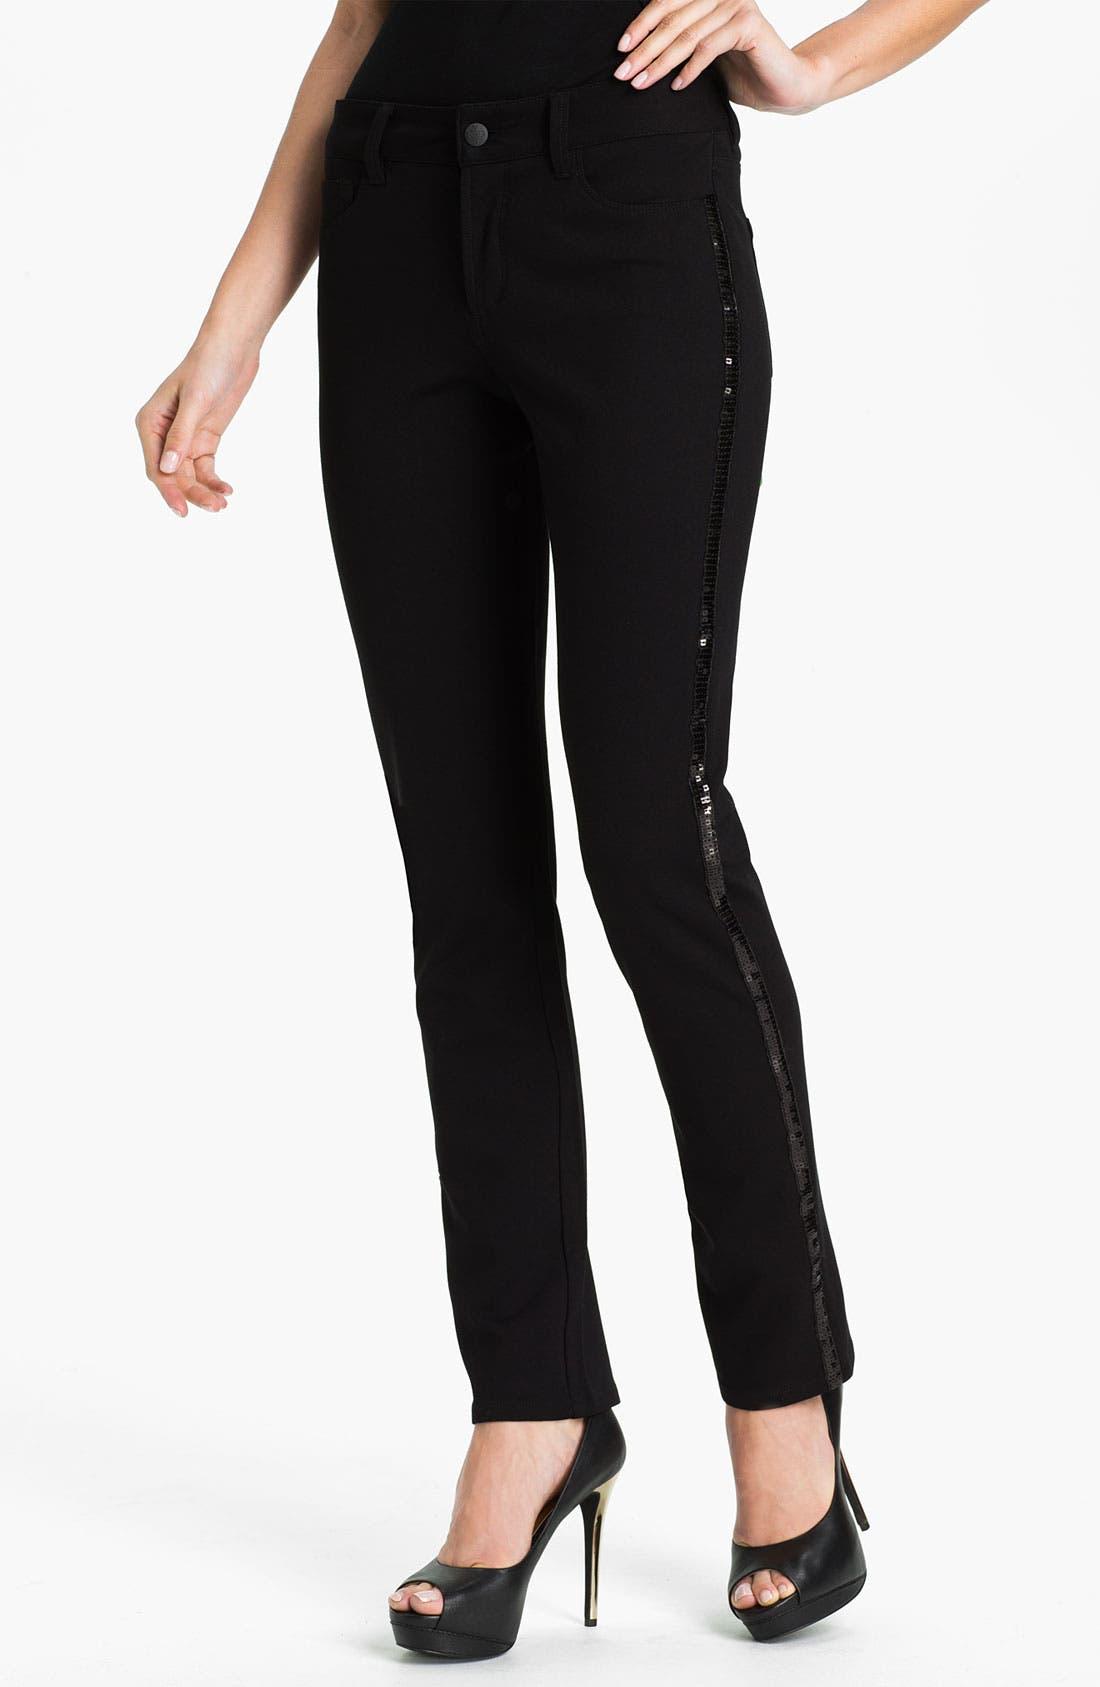 Main Image - NYDJ 'Sheri - Tuxedo' Skinny Twill Jeans